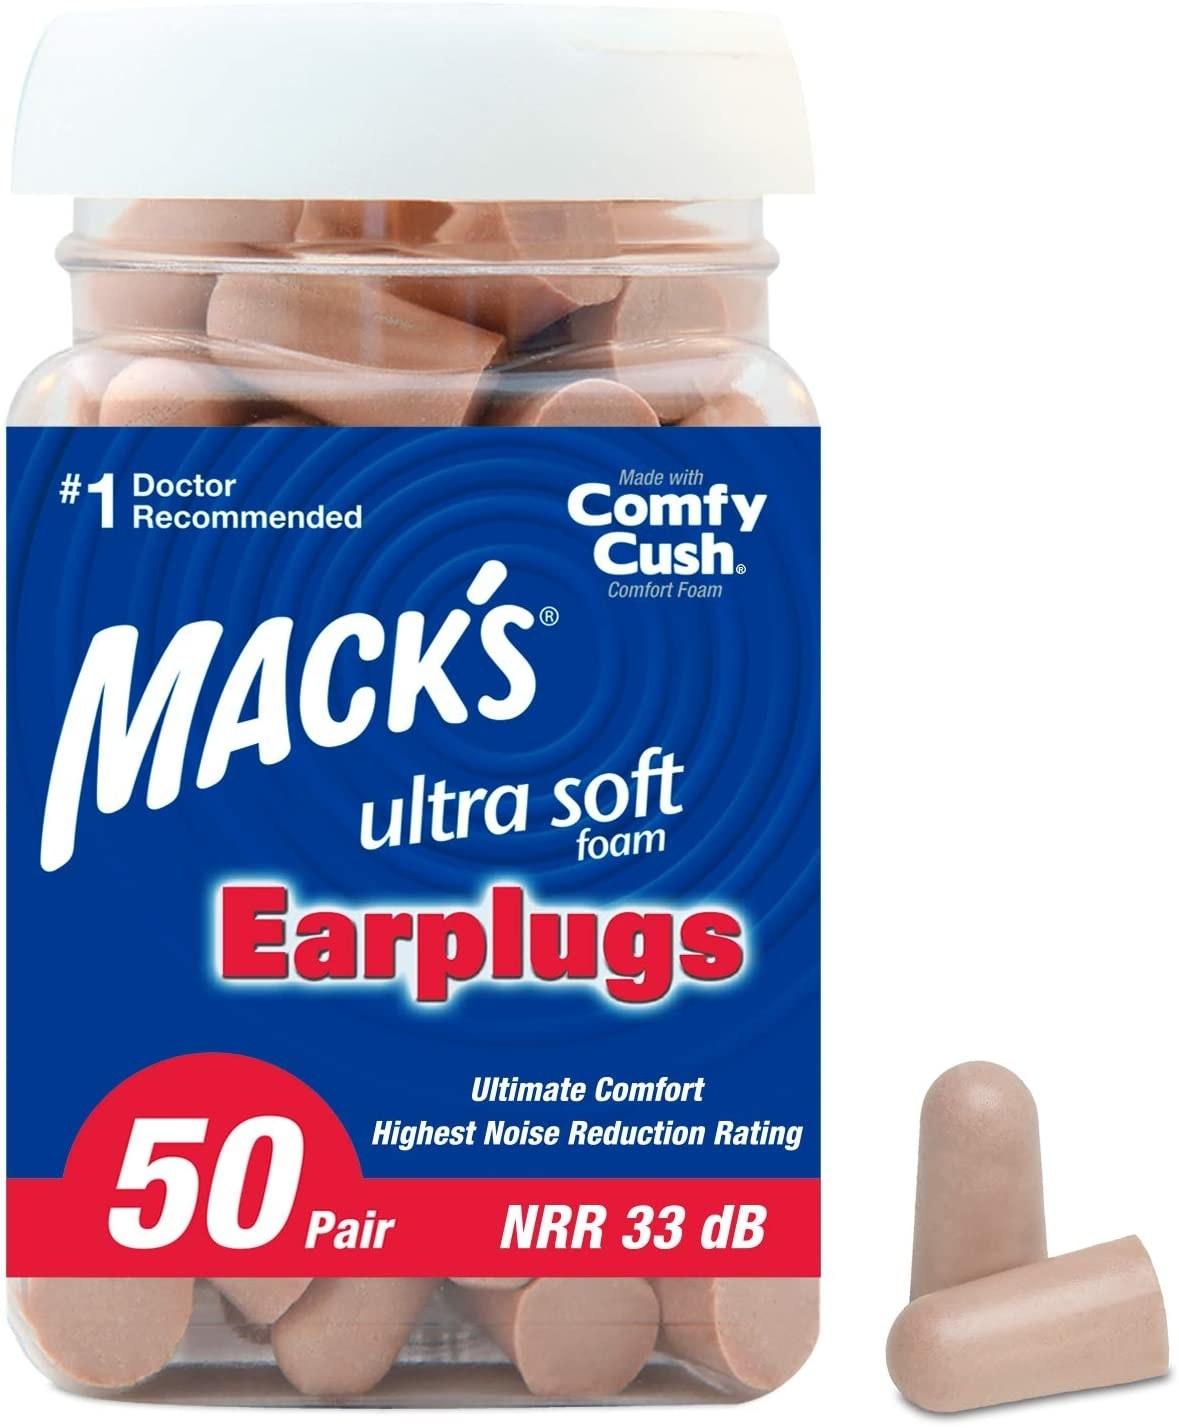 mack's ultra soft earplugs packaging